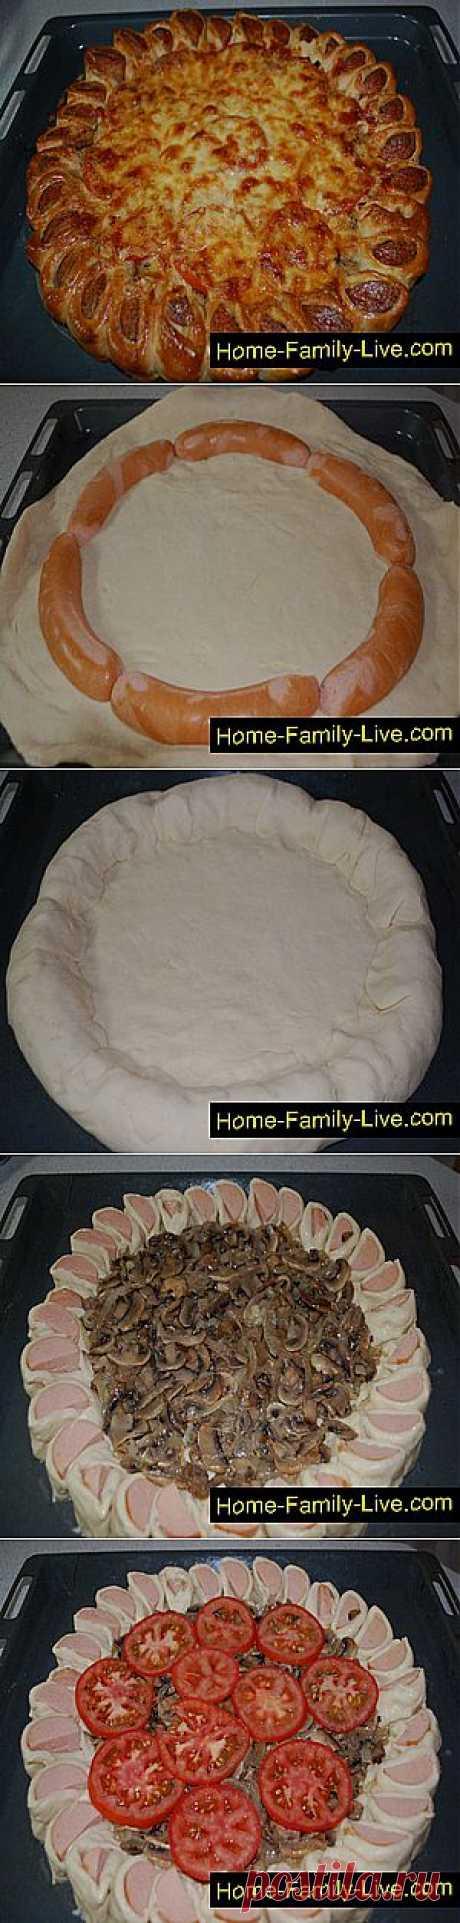 Кулинарные рецепты Пирог с грибами » Кулинарные рецепты